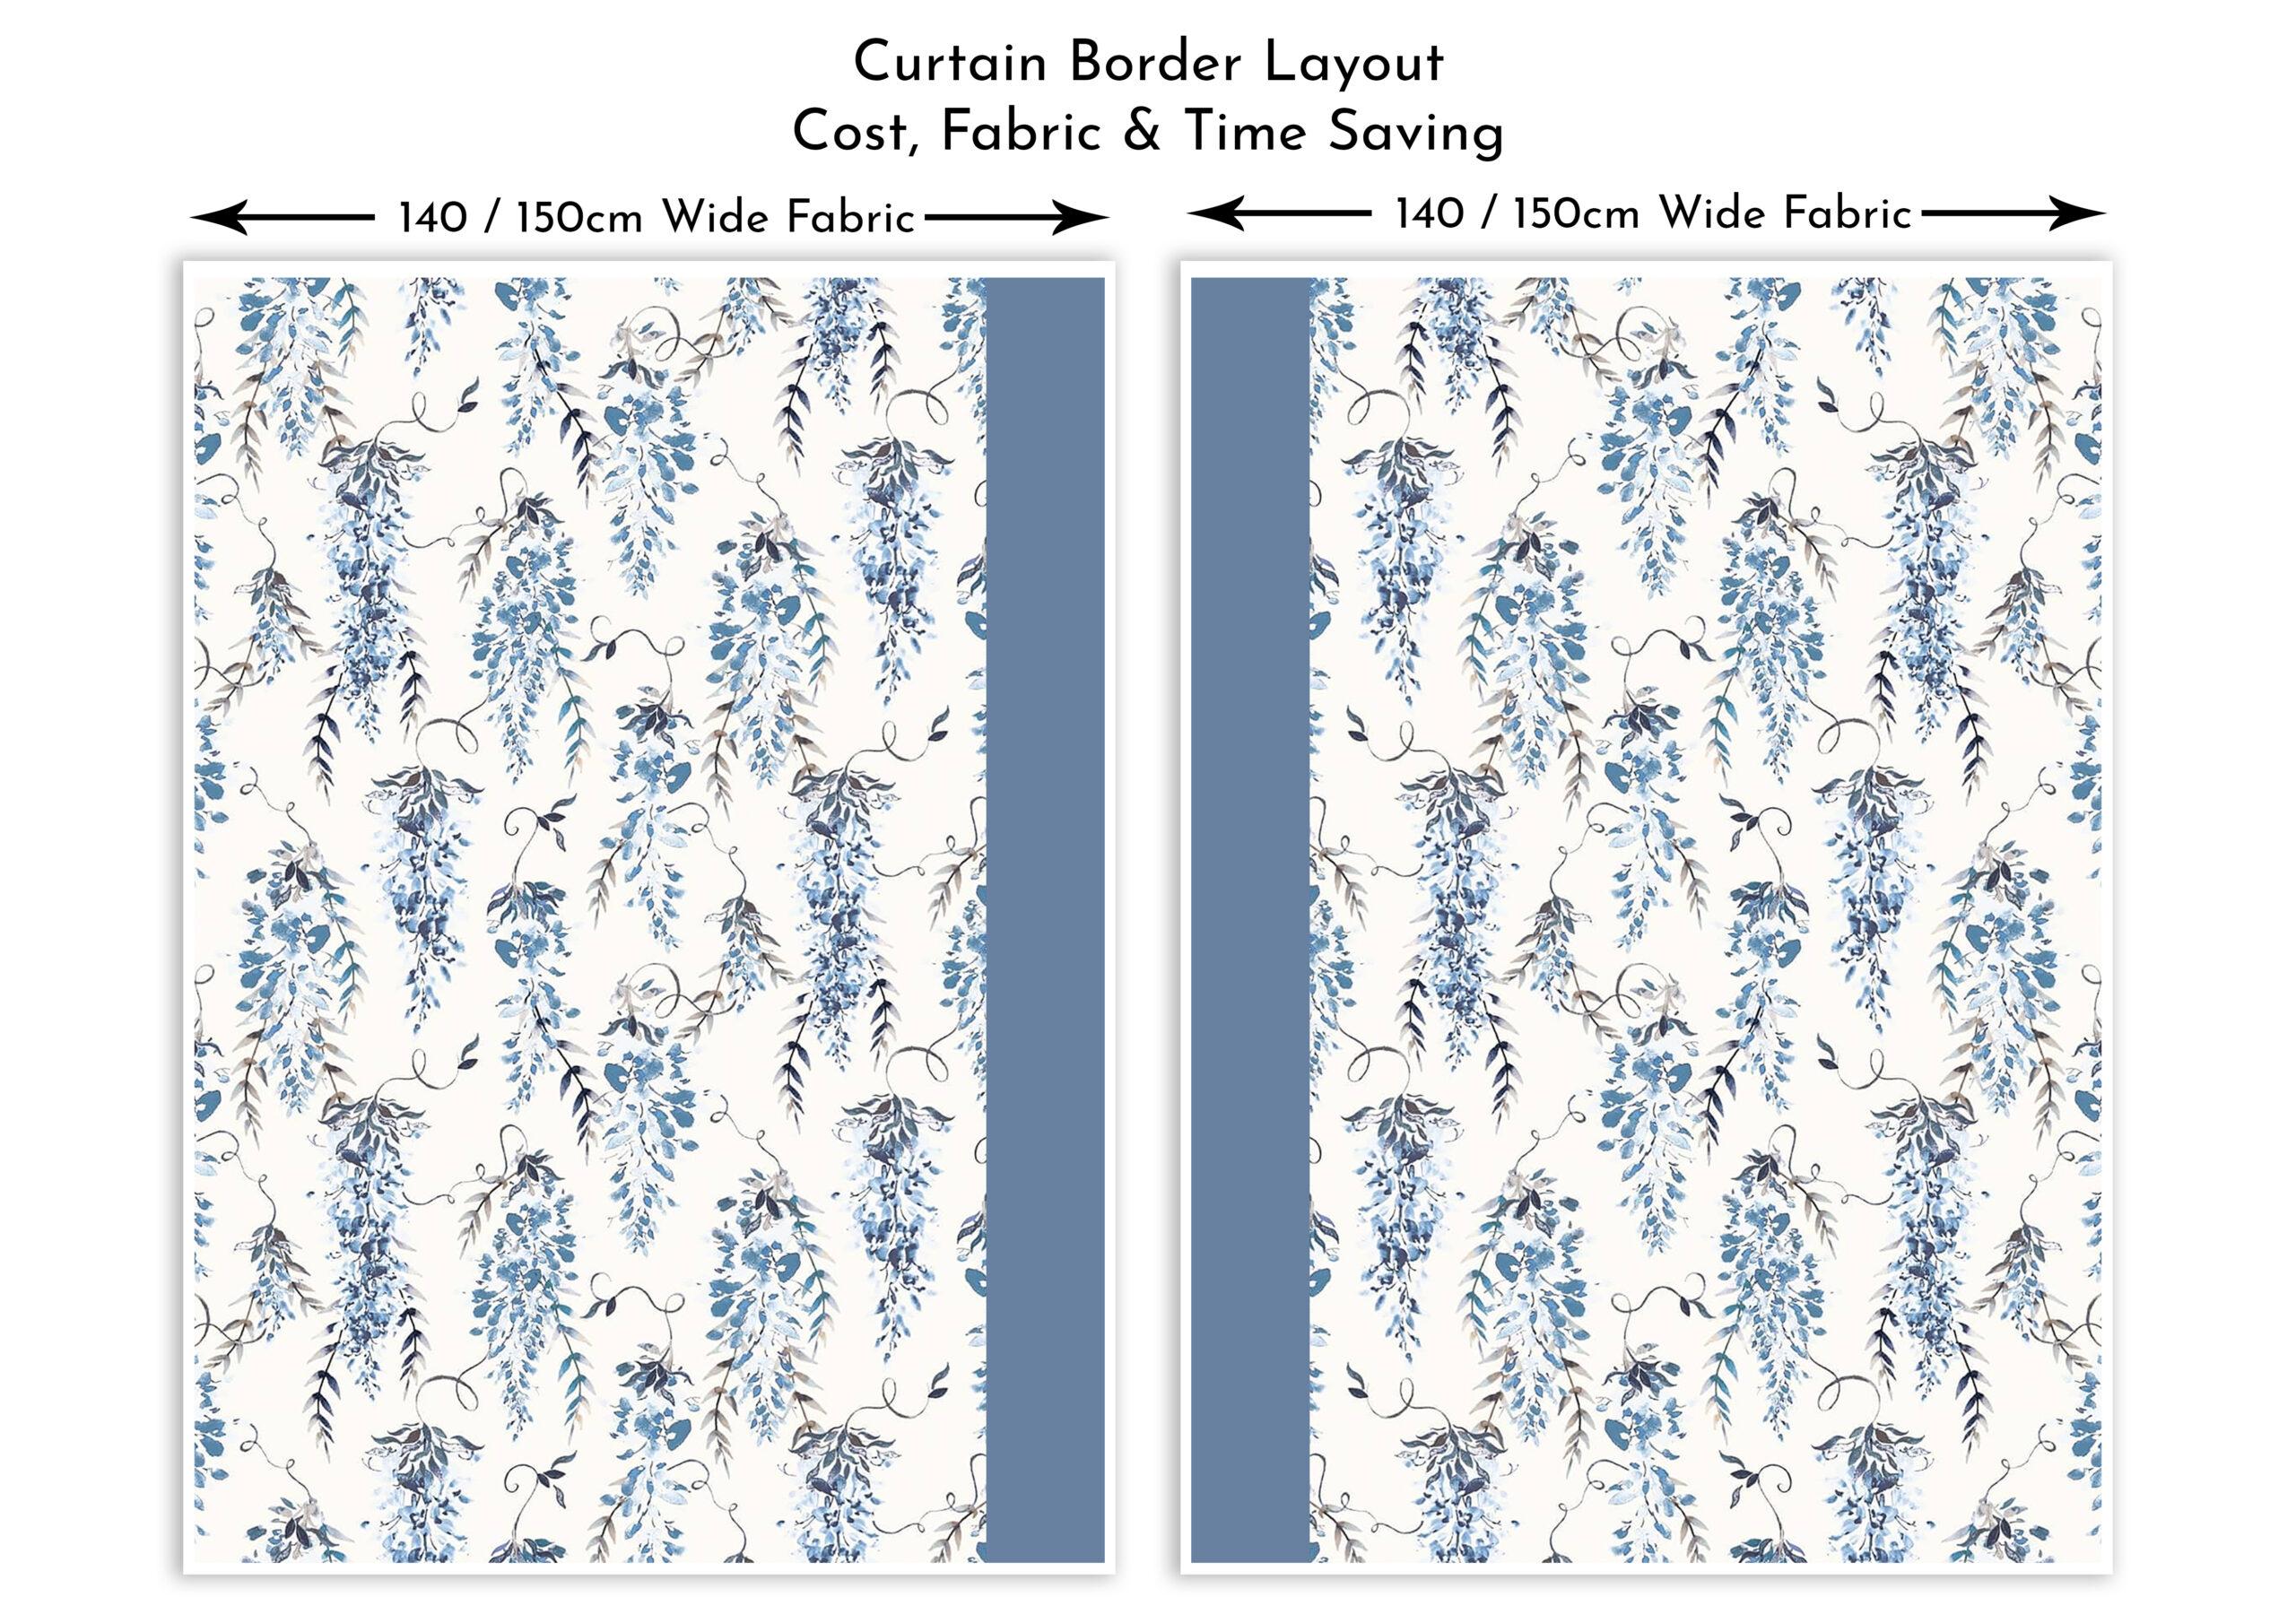 curtain layout